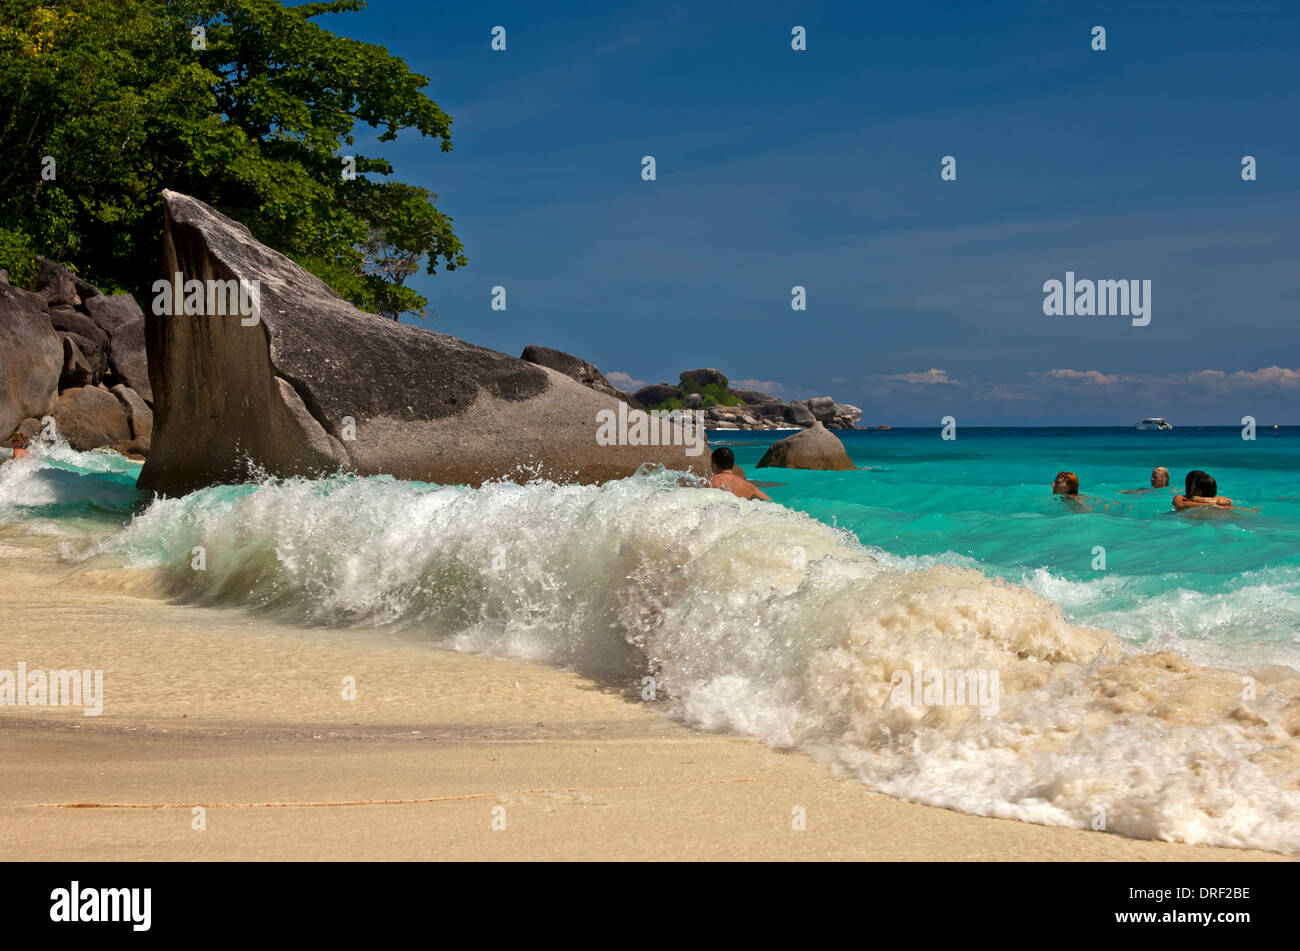 Dream beach on the Koh Miang Island, Similan Islands, Mu Ko Similan National Park, Thailand - Stock Image